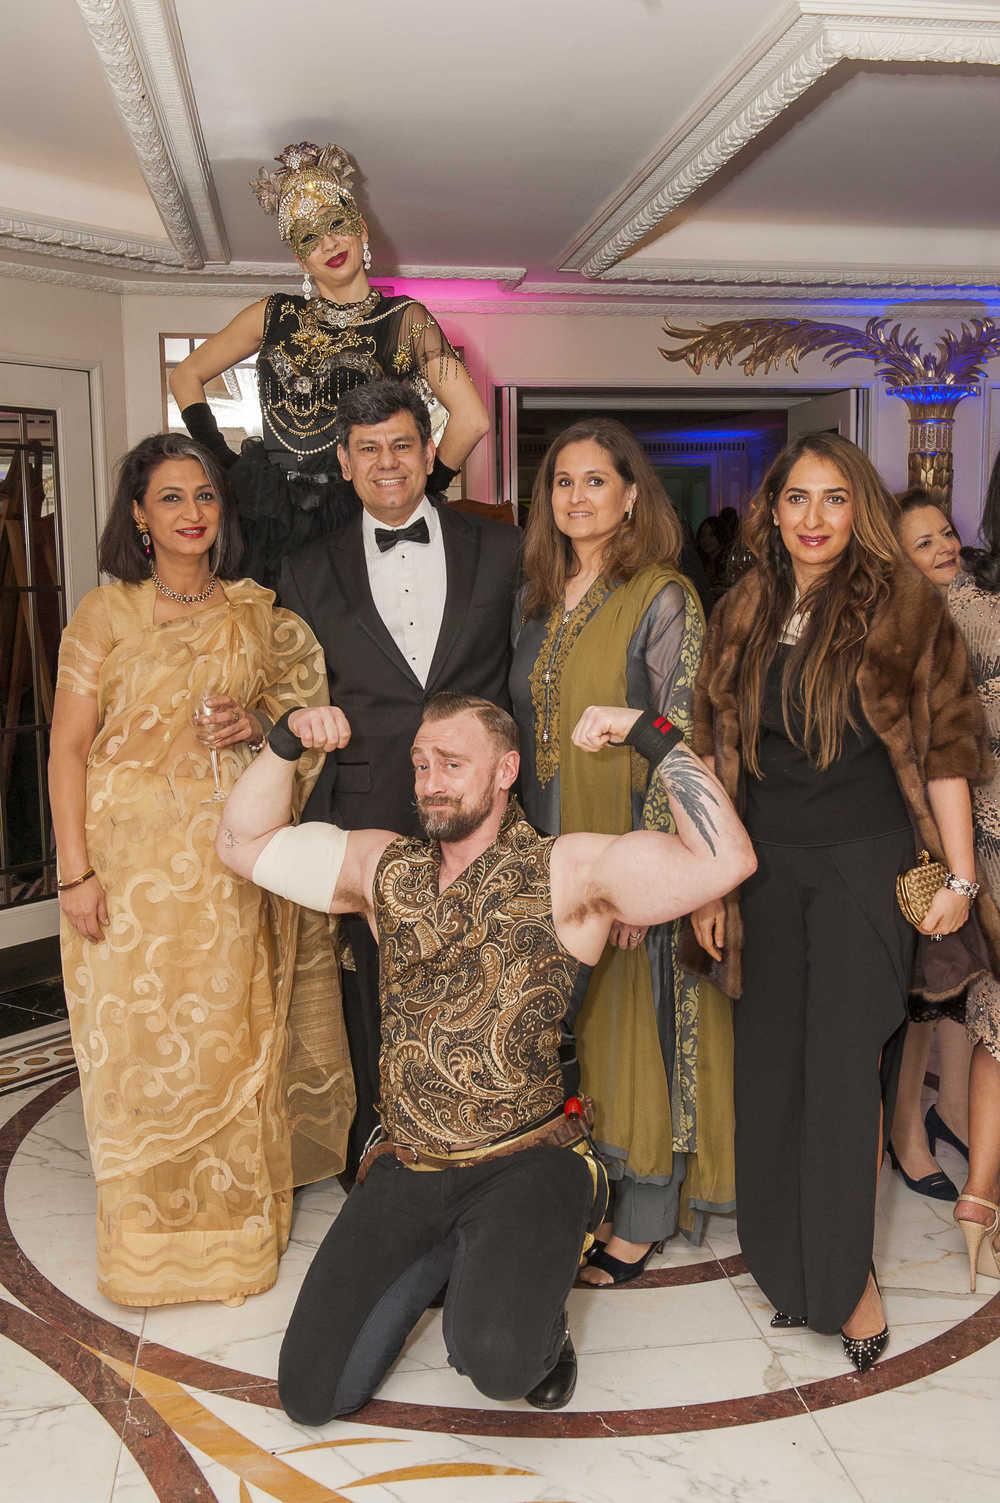 Abintah Adamjee Ahsan & Ayesha Jamil & Mahreen Qureshi.jpg